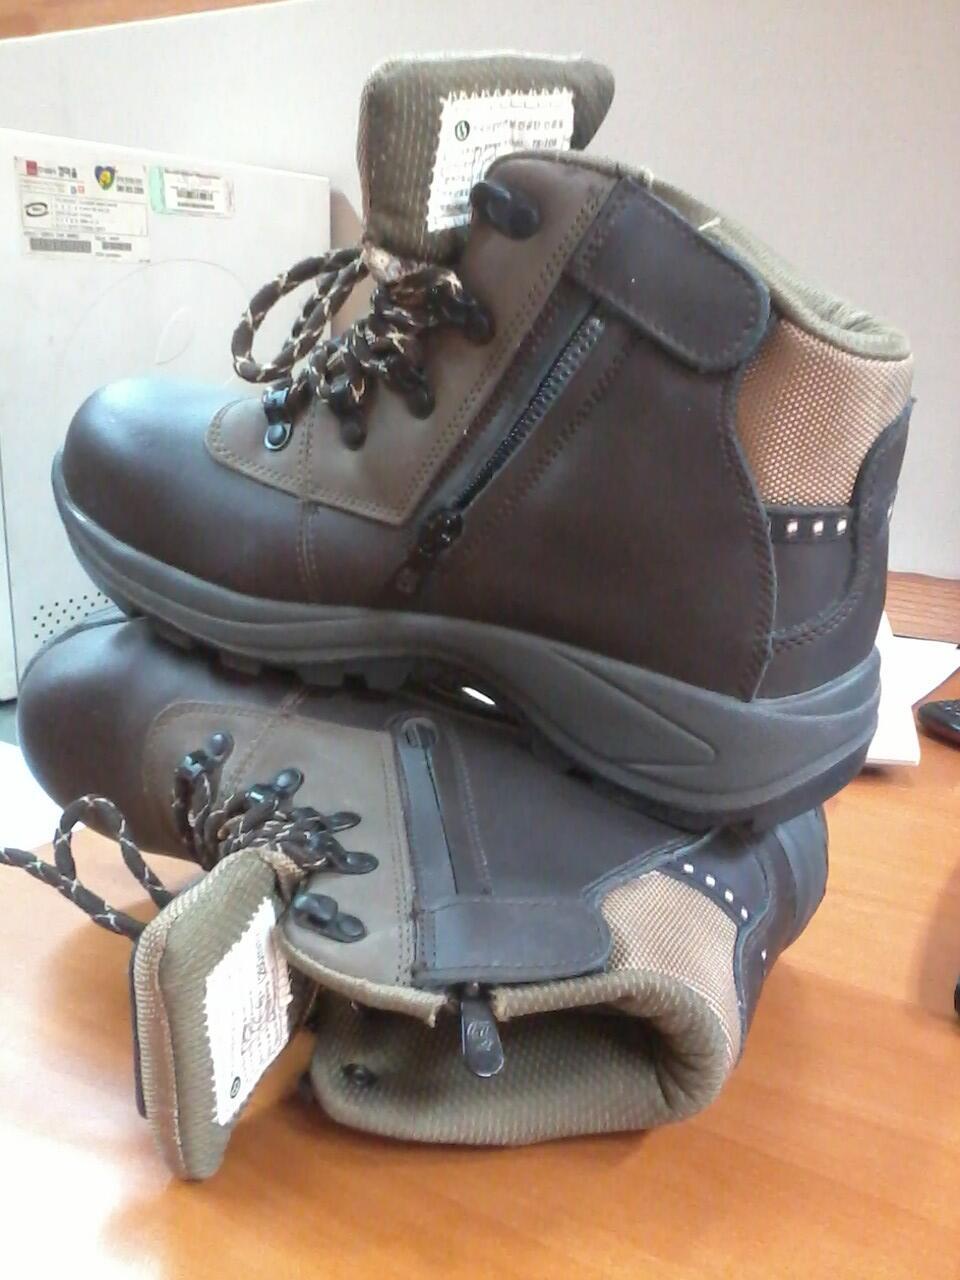 Sepatu Gunung/ Hiking/ Safety Korea merk TrekSta Hypergrip